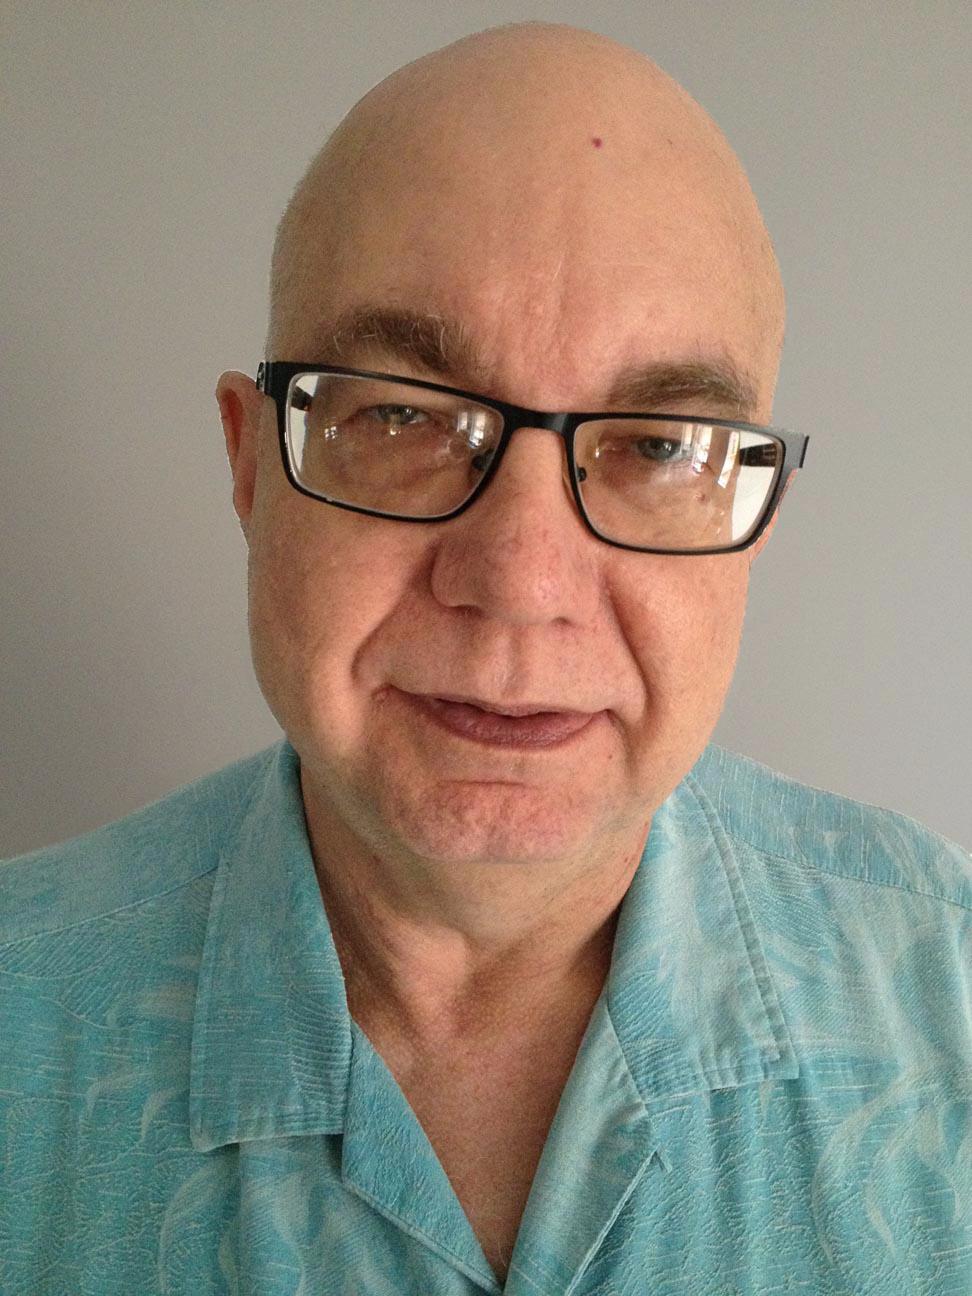 RICHARD OBERG, MD